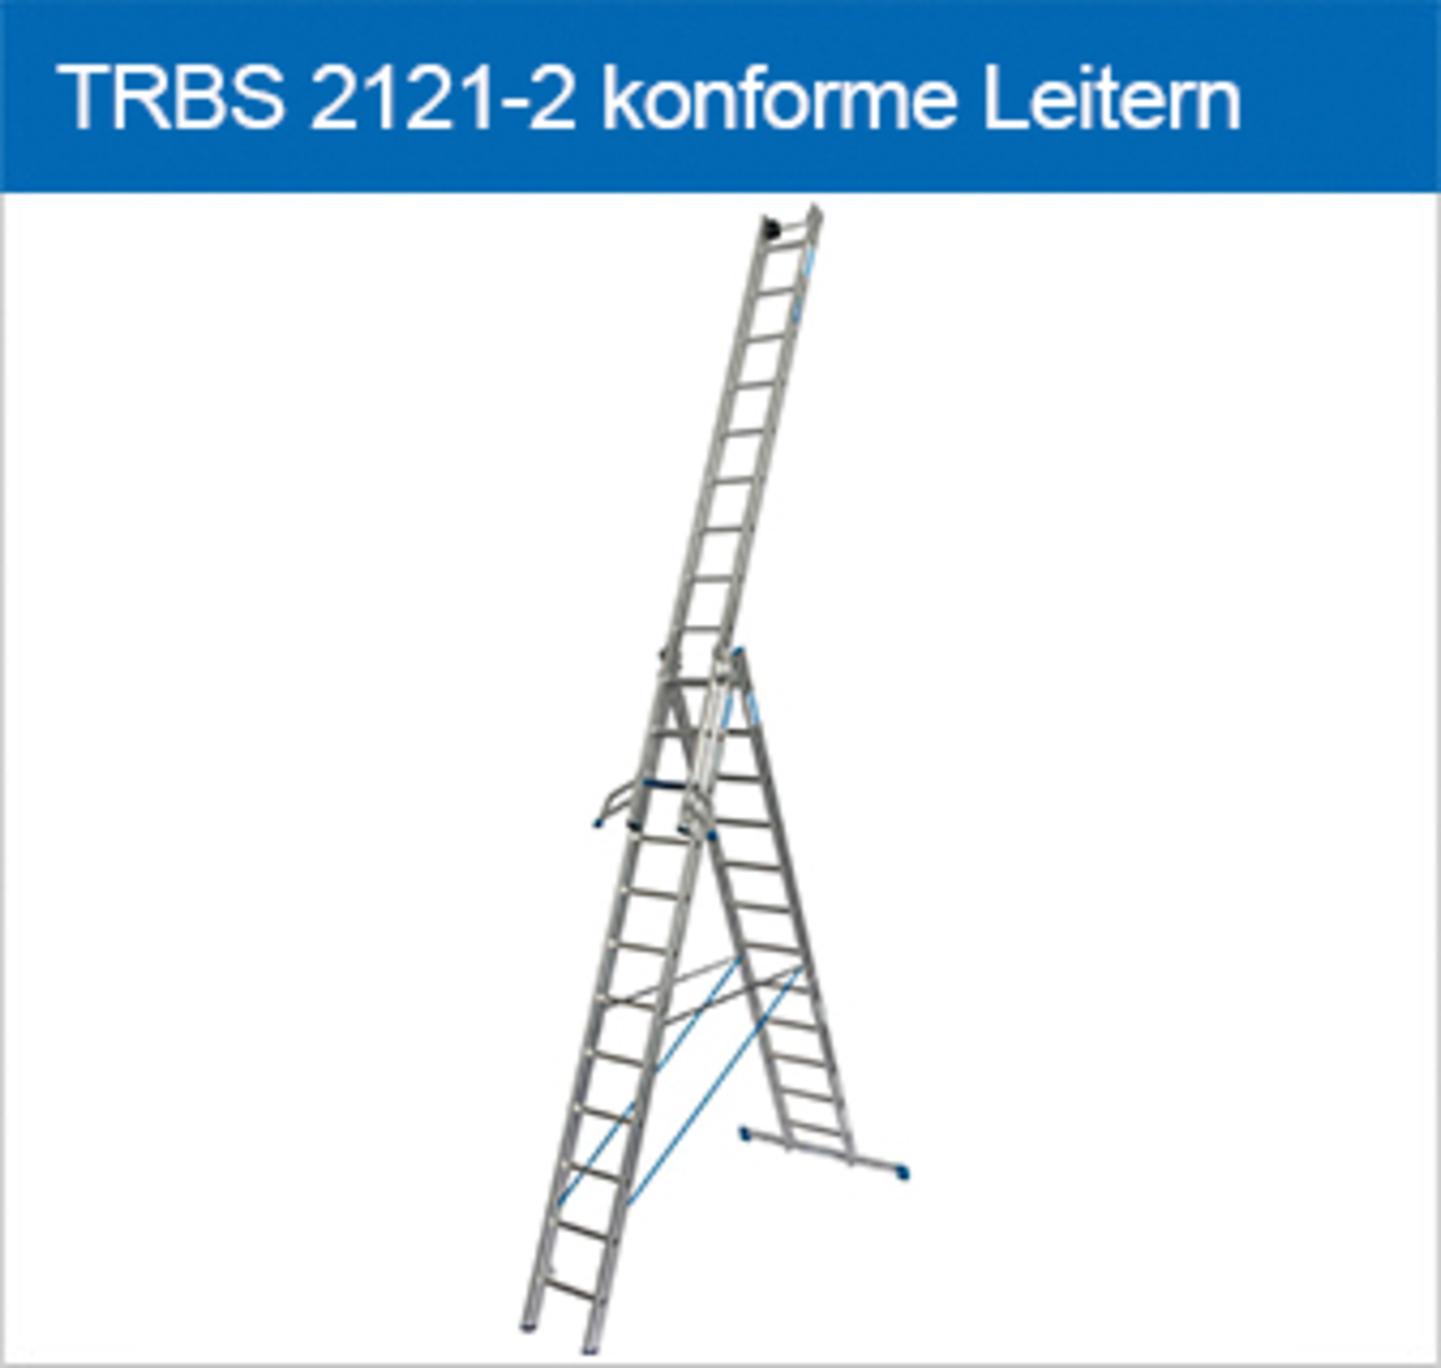 TRBS 2121-2 konforme Leitern